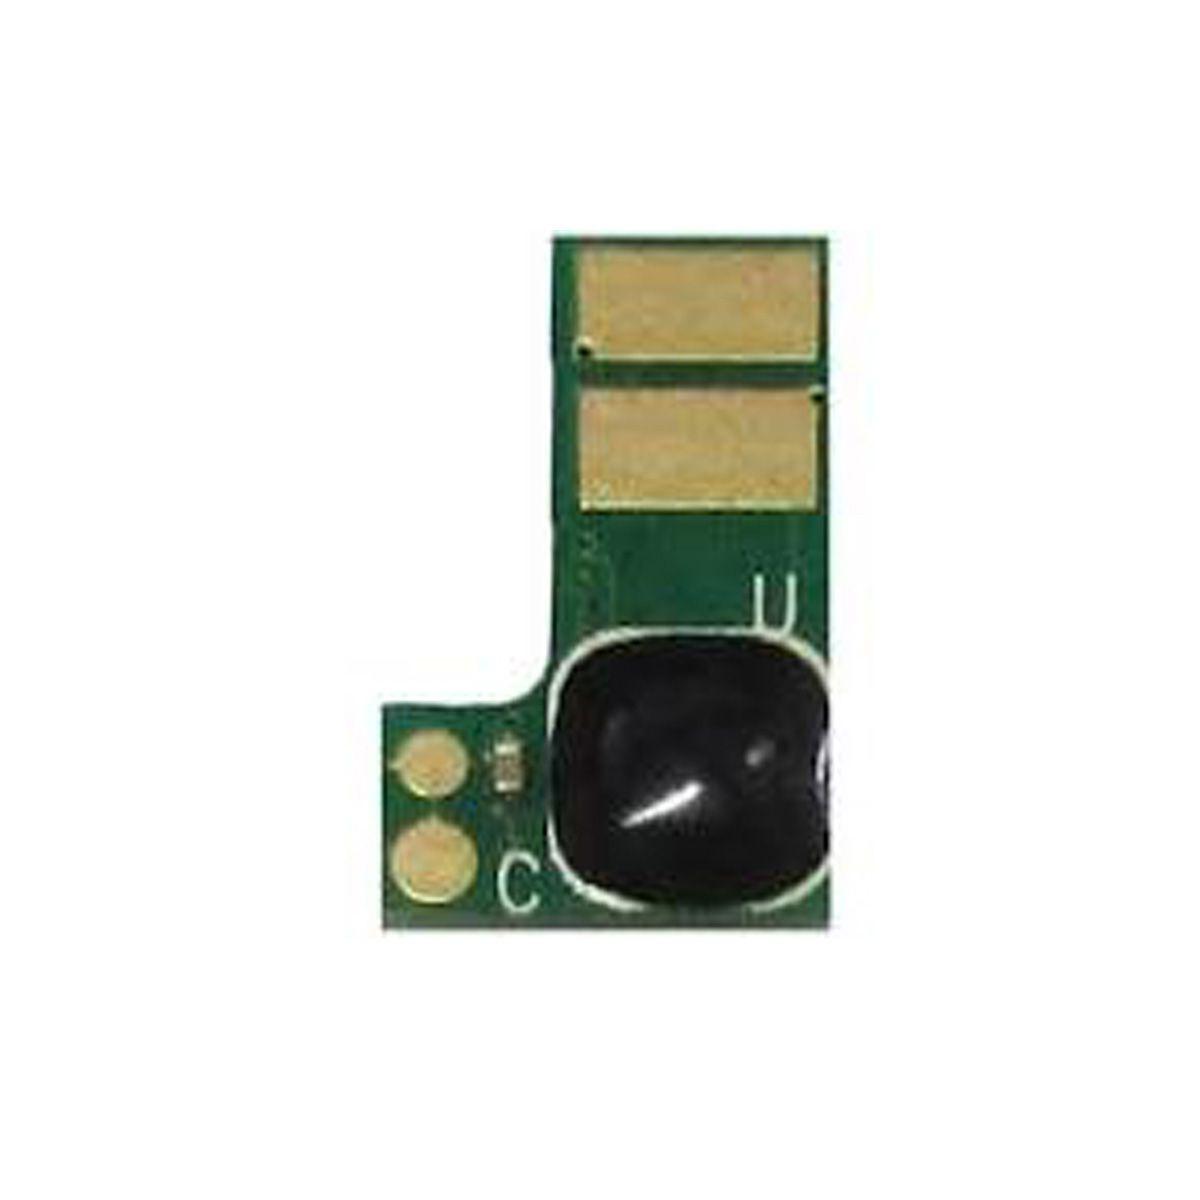 Chip HP CF218A CF218 218a 18a - M132NW M132FN M132A - 1k